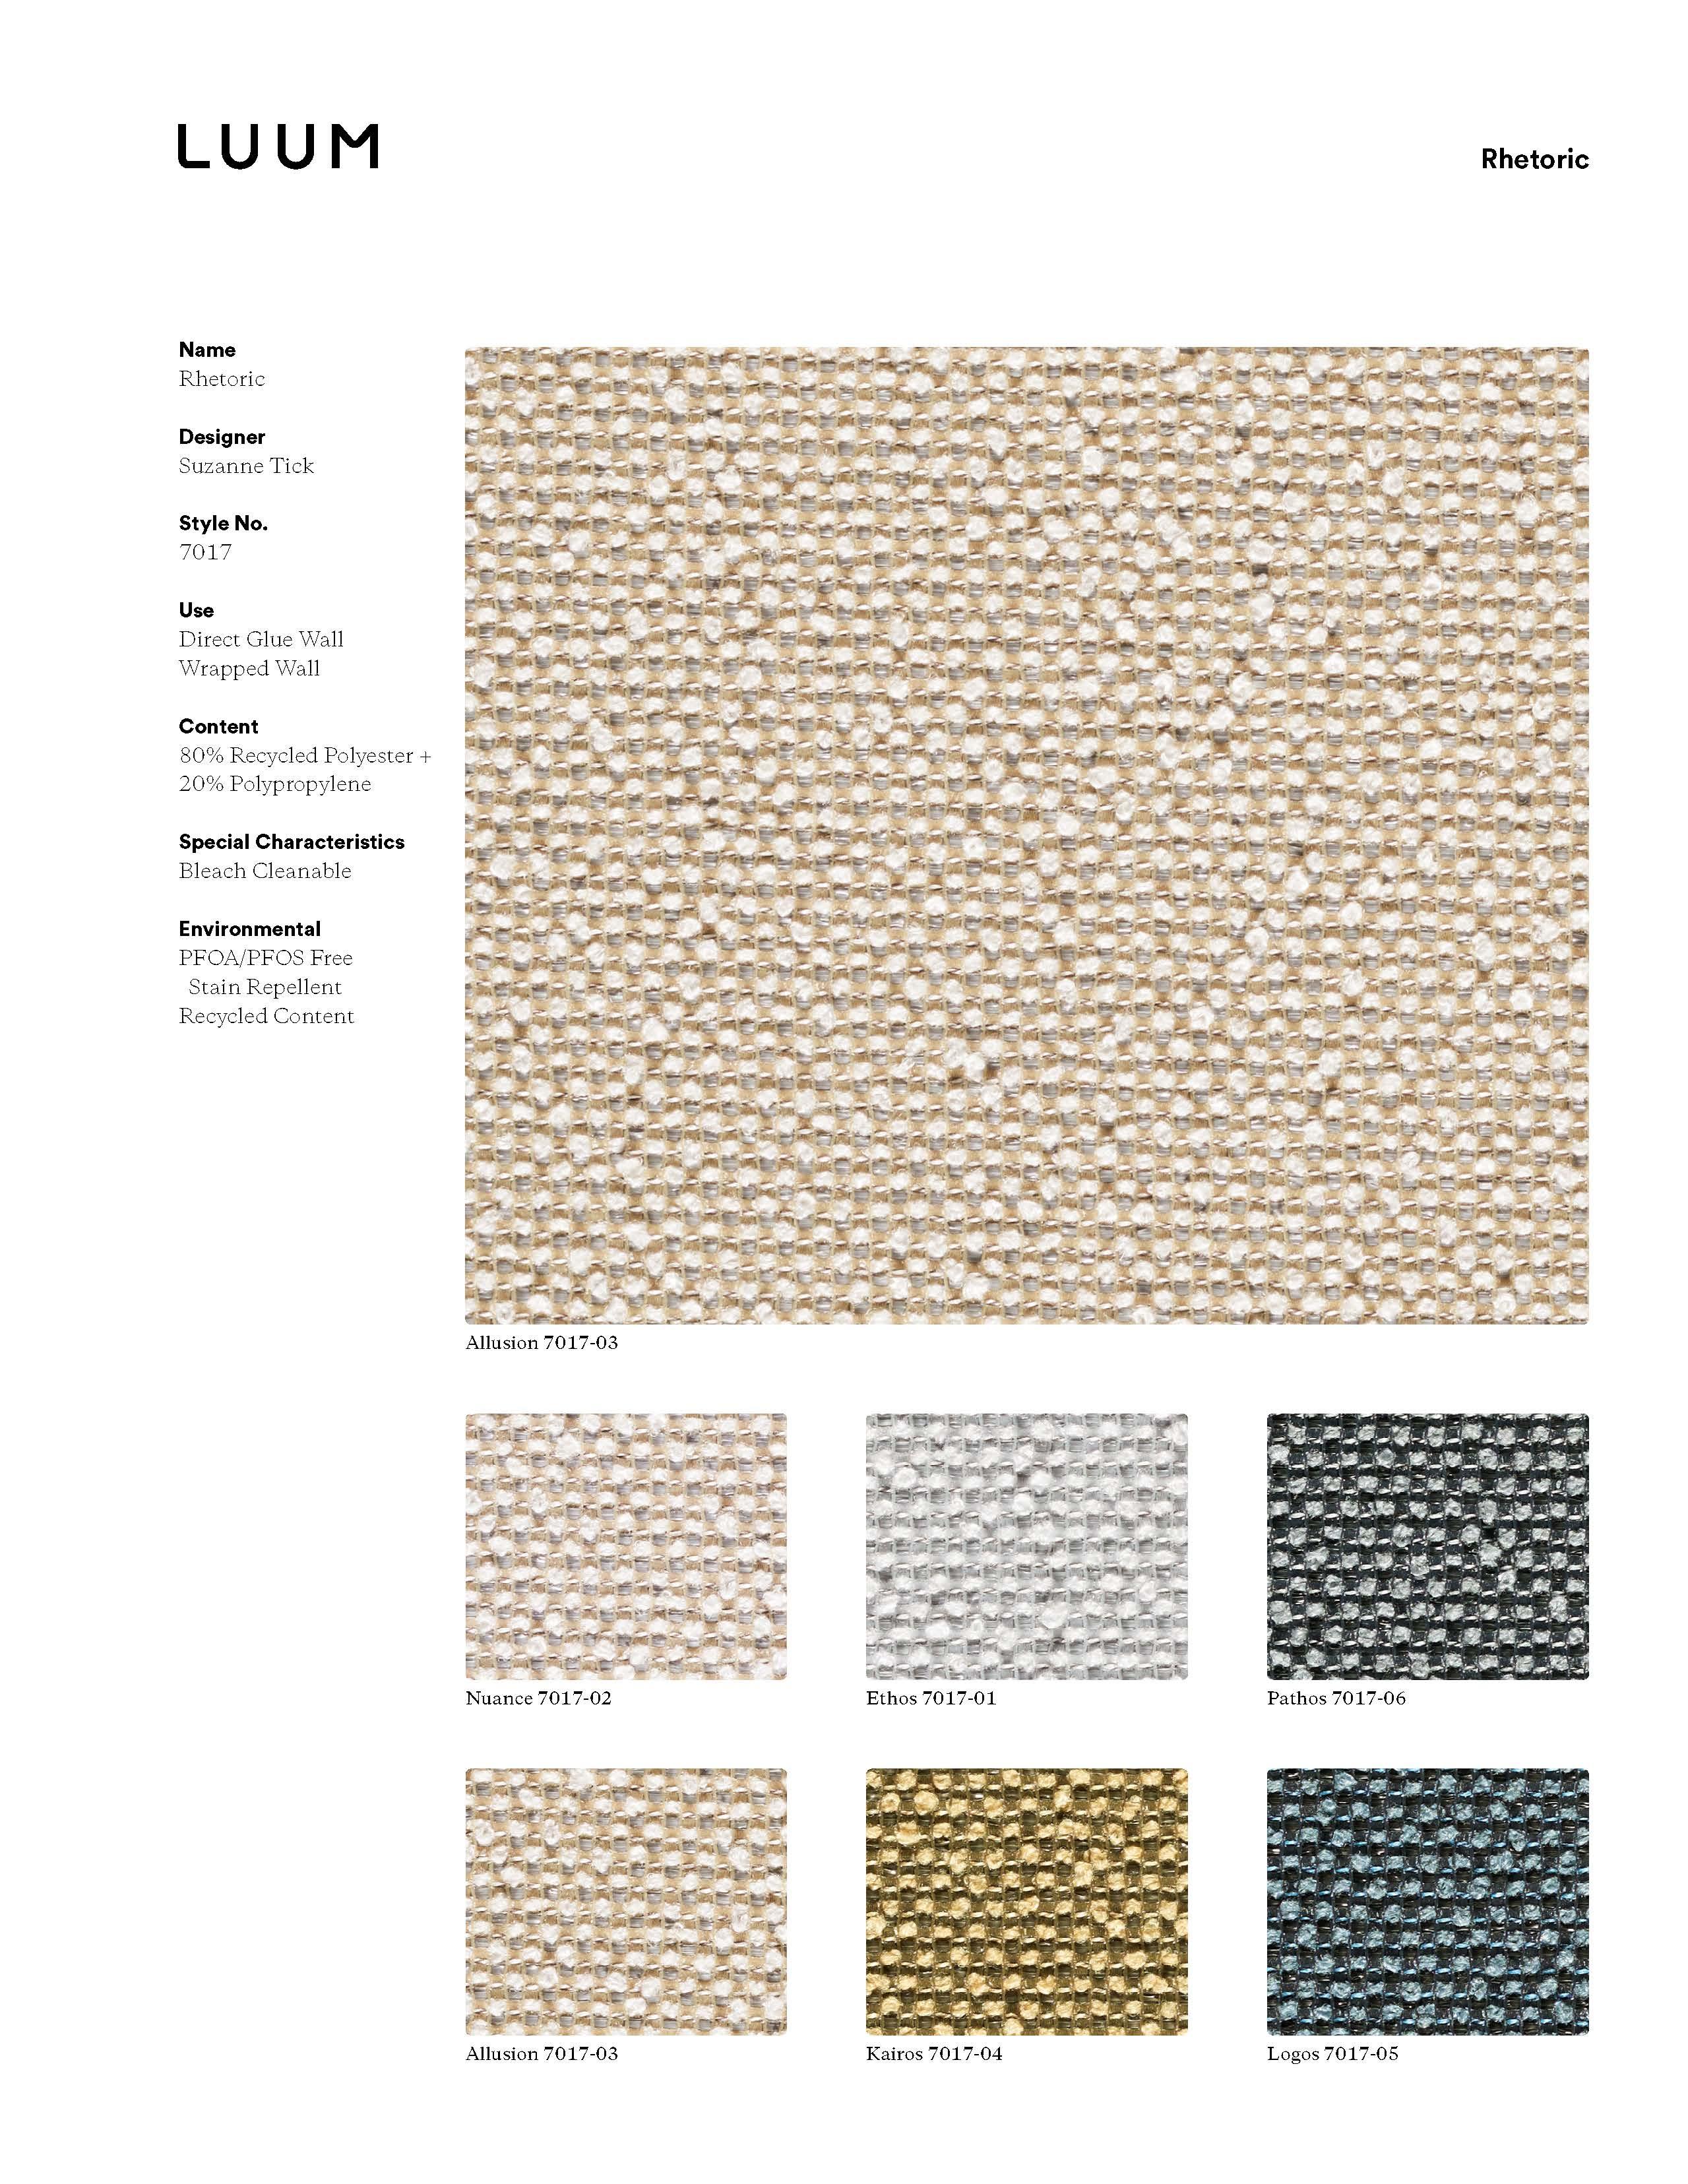 Rhetoric - Nuance - 7017 - 02 Sample Card